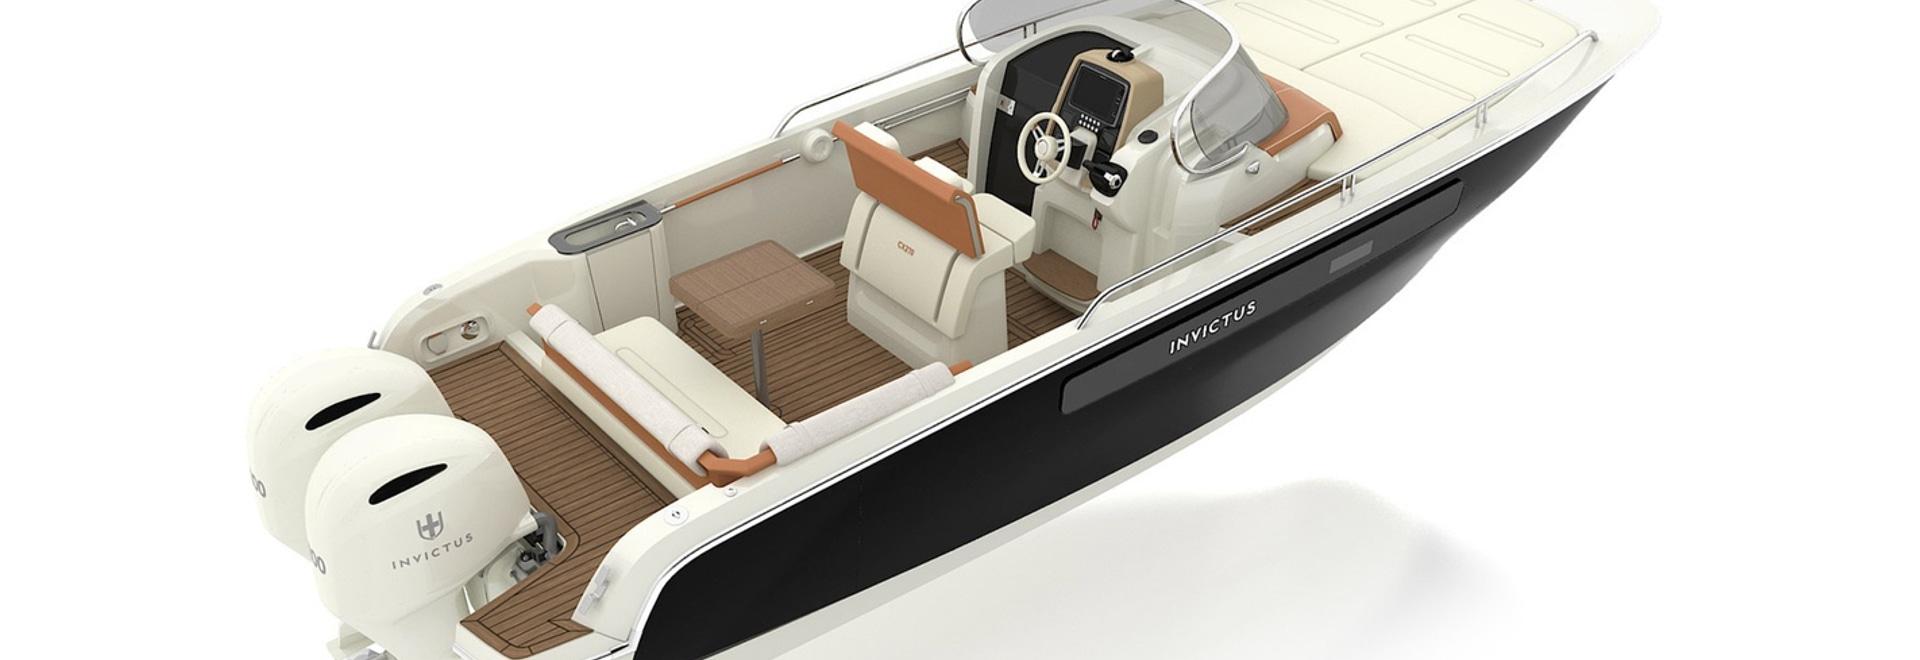 The new 8.1 metre Invictus CX270 superyacht tender